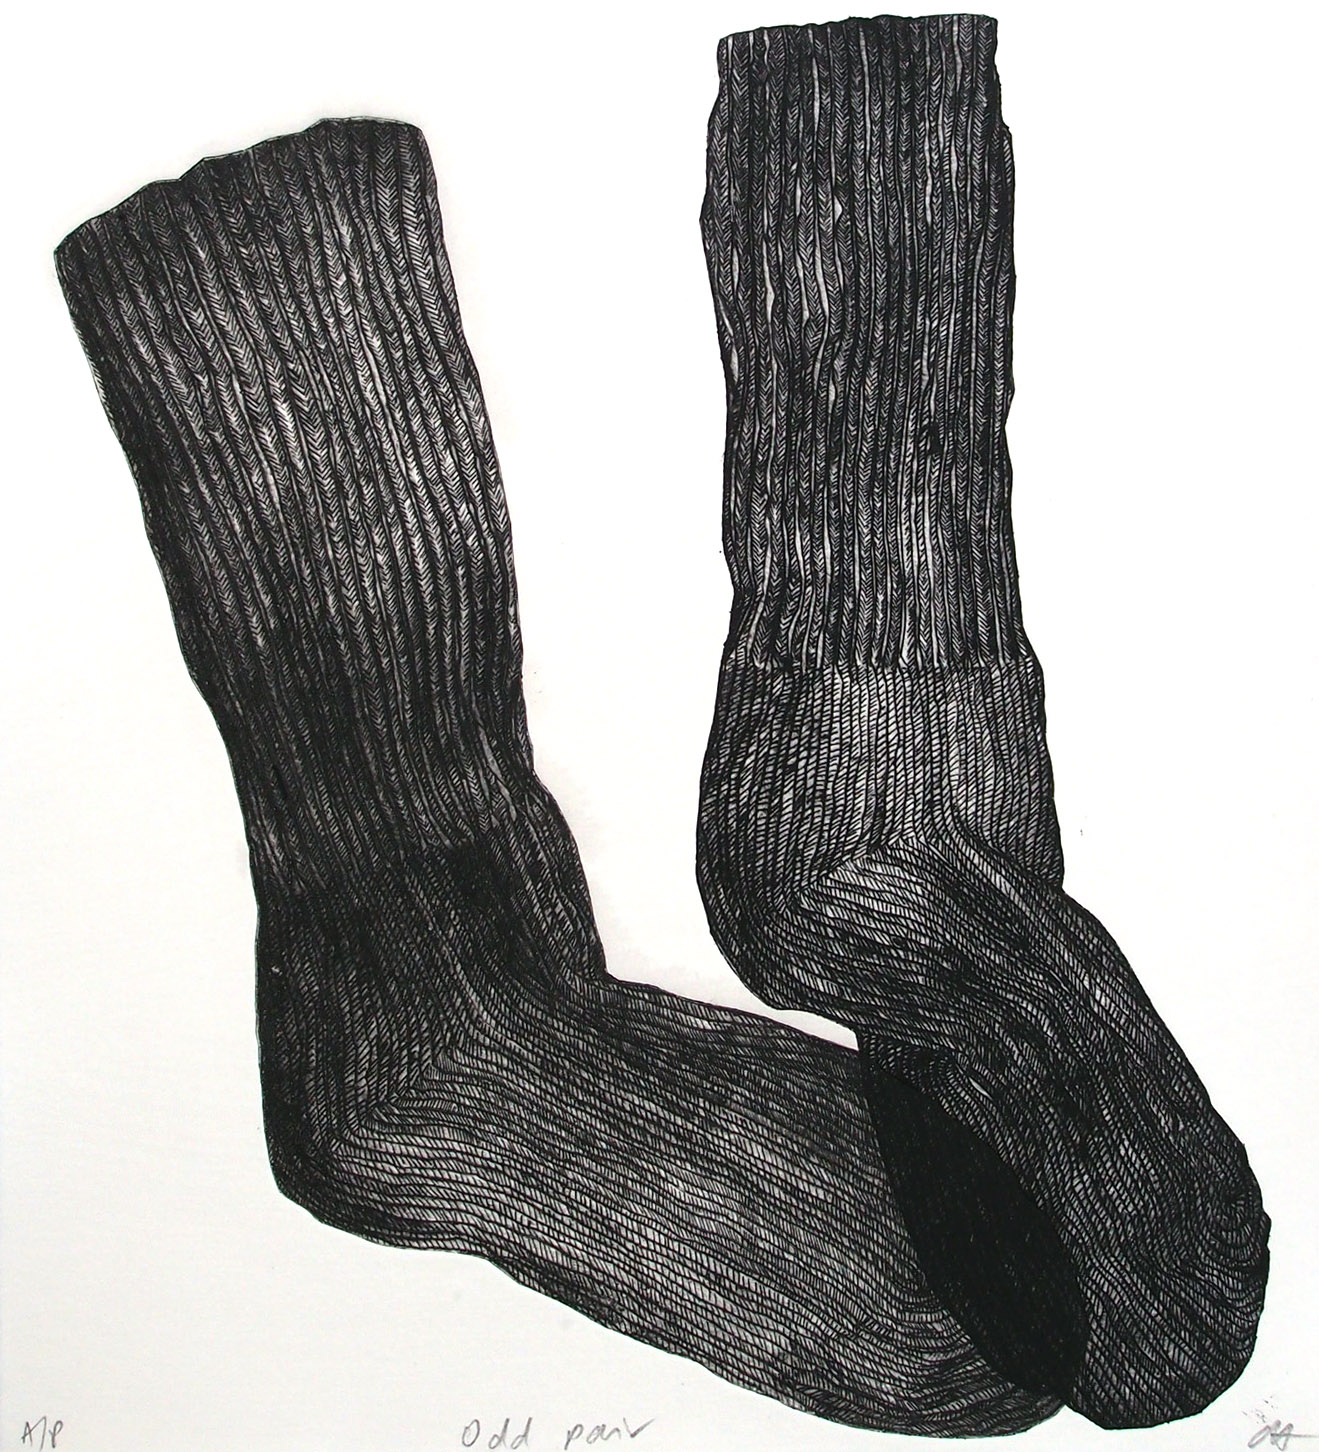 'Odd Pair', 2015